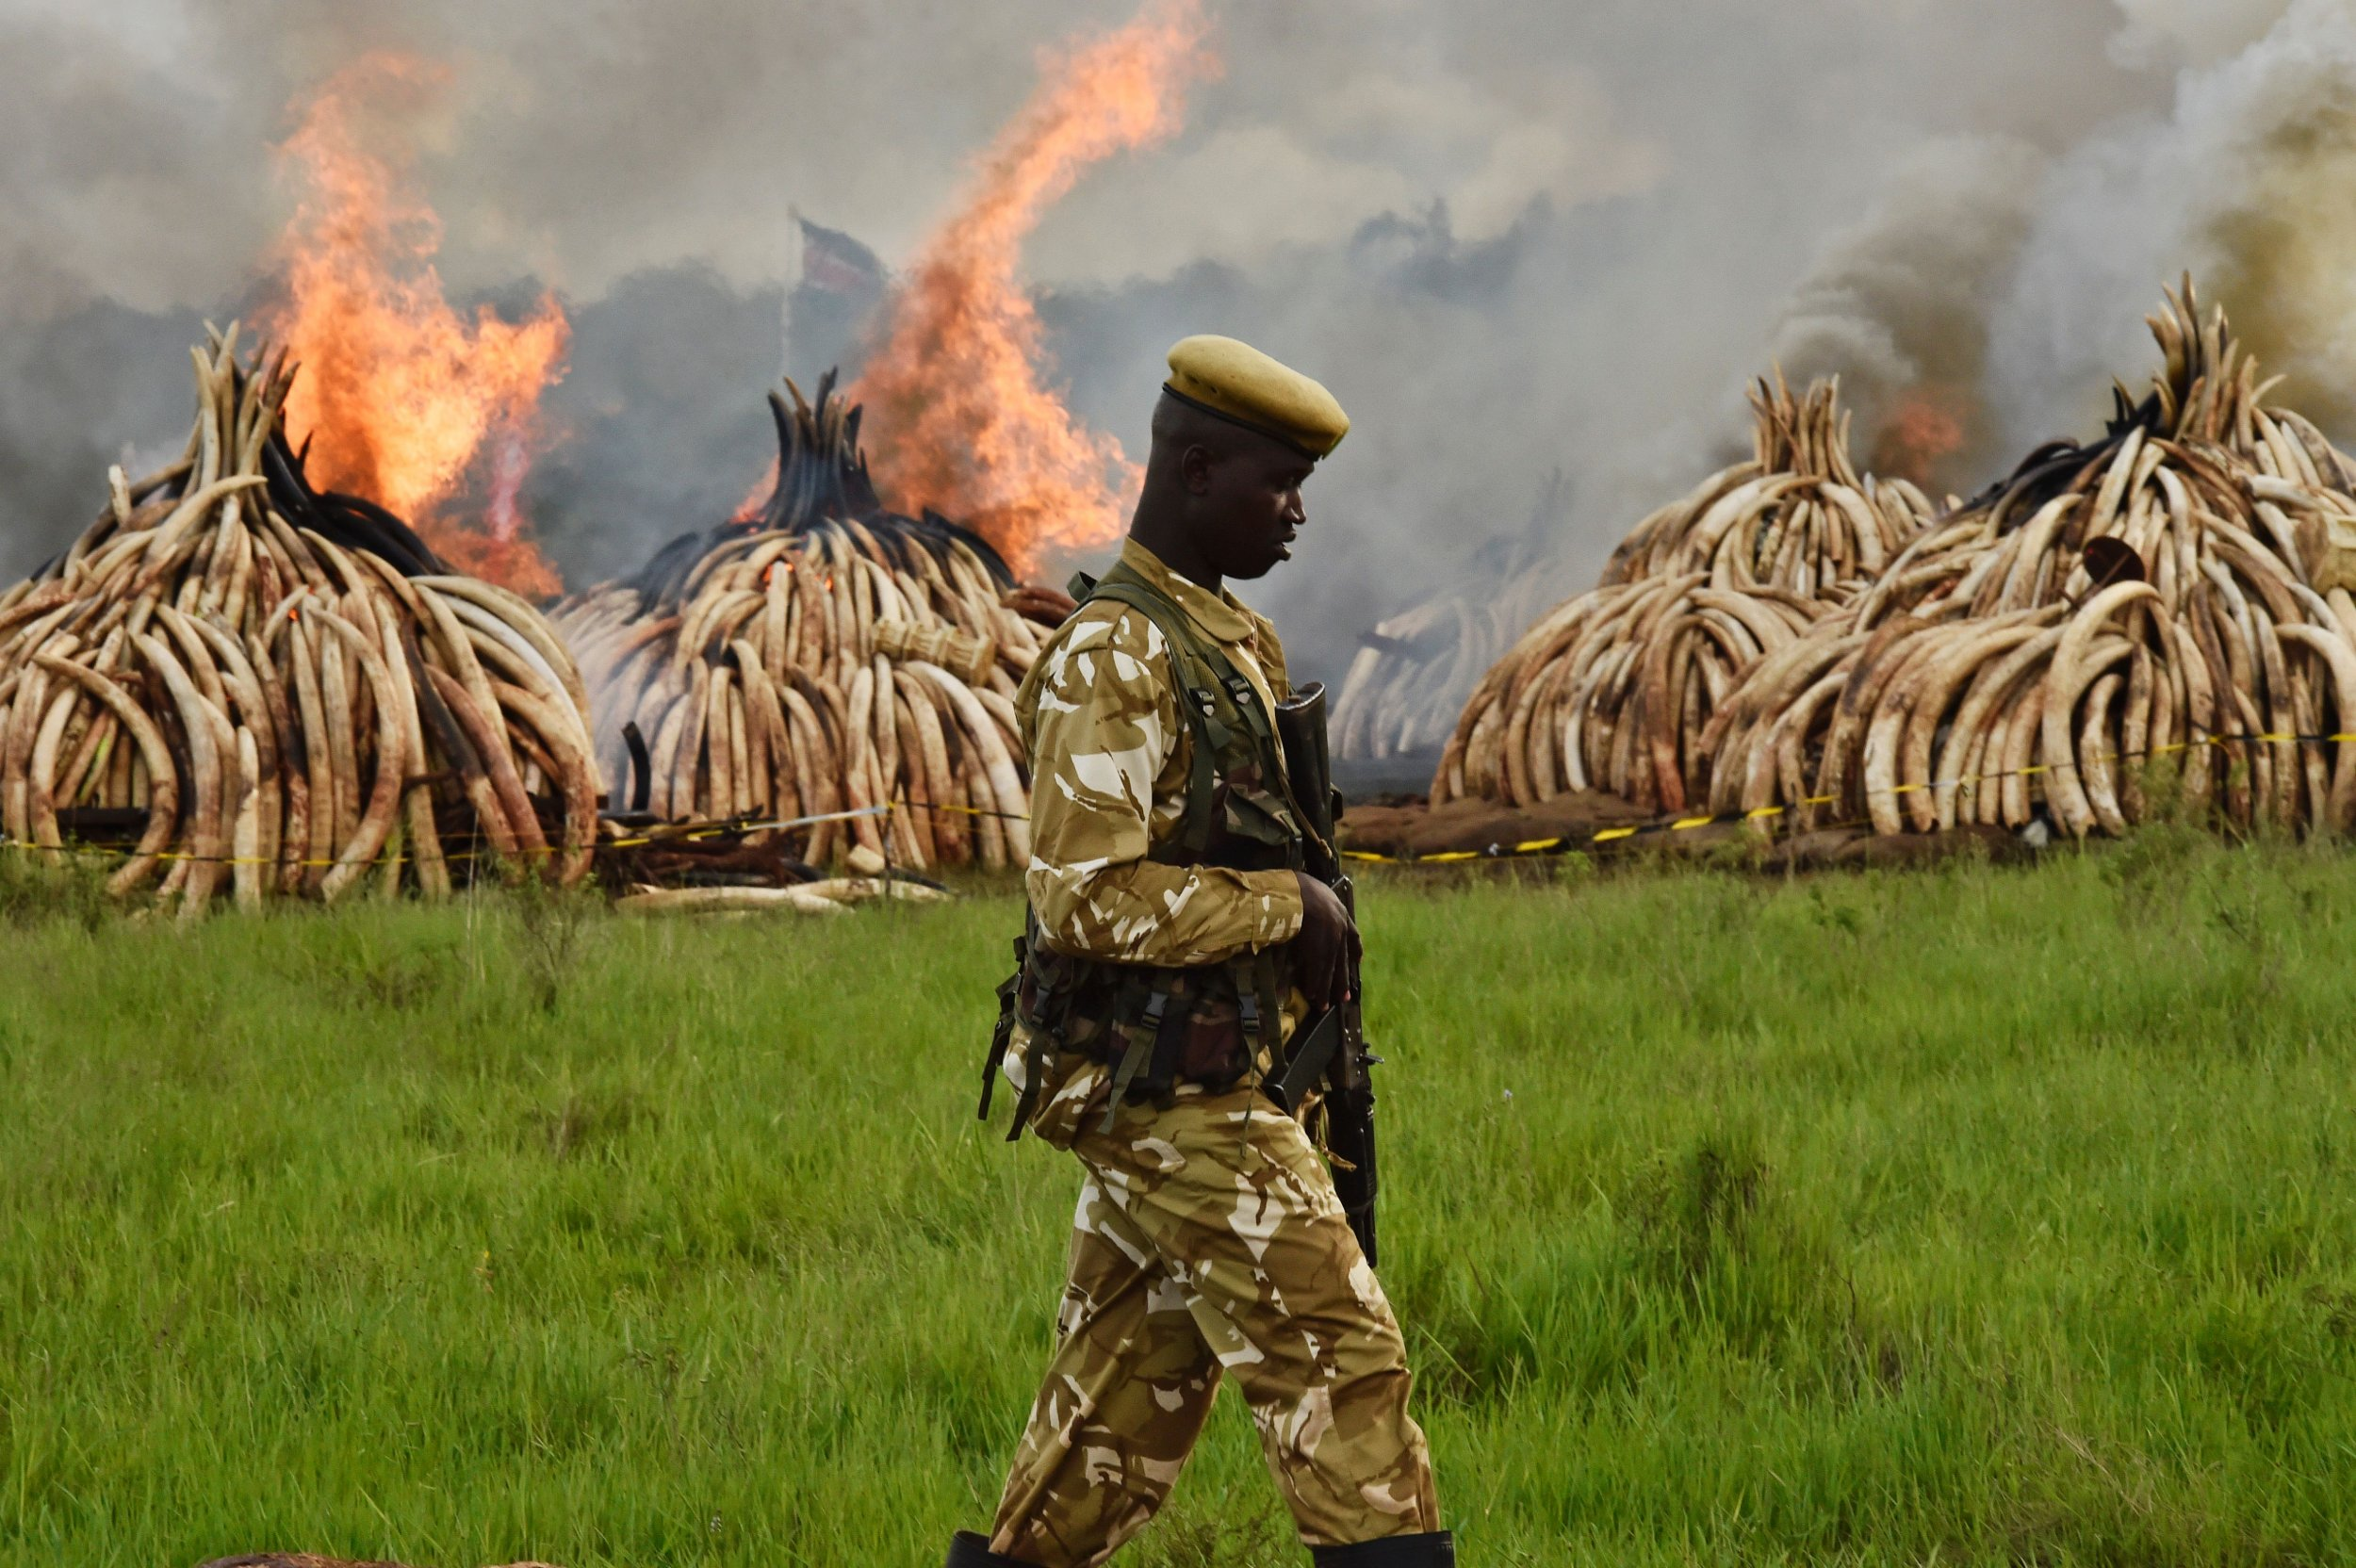 Kenya Ivory Fire